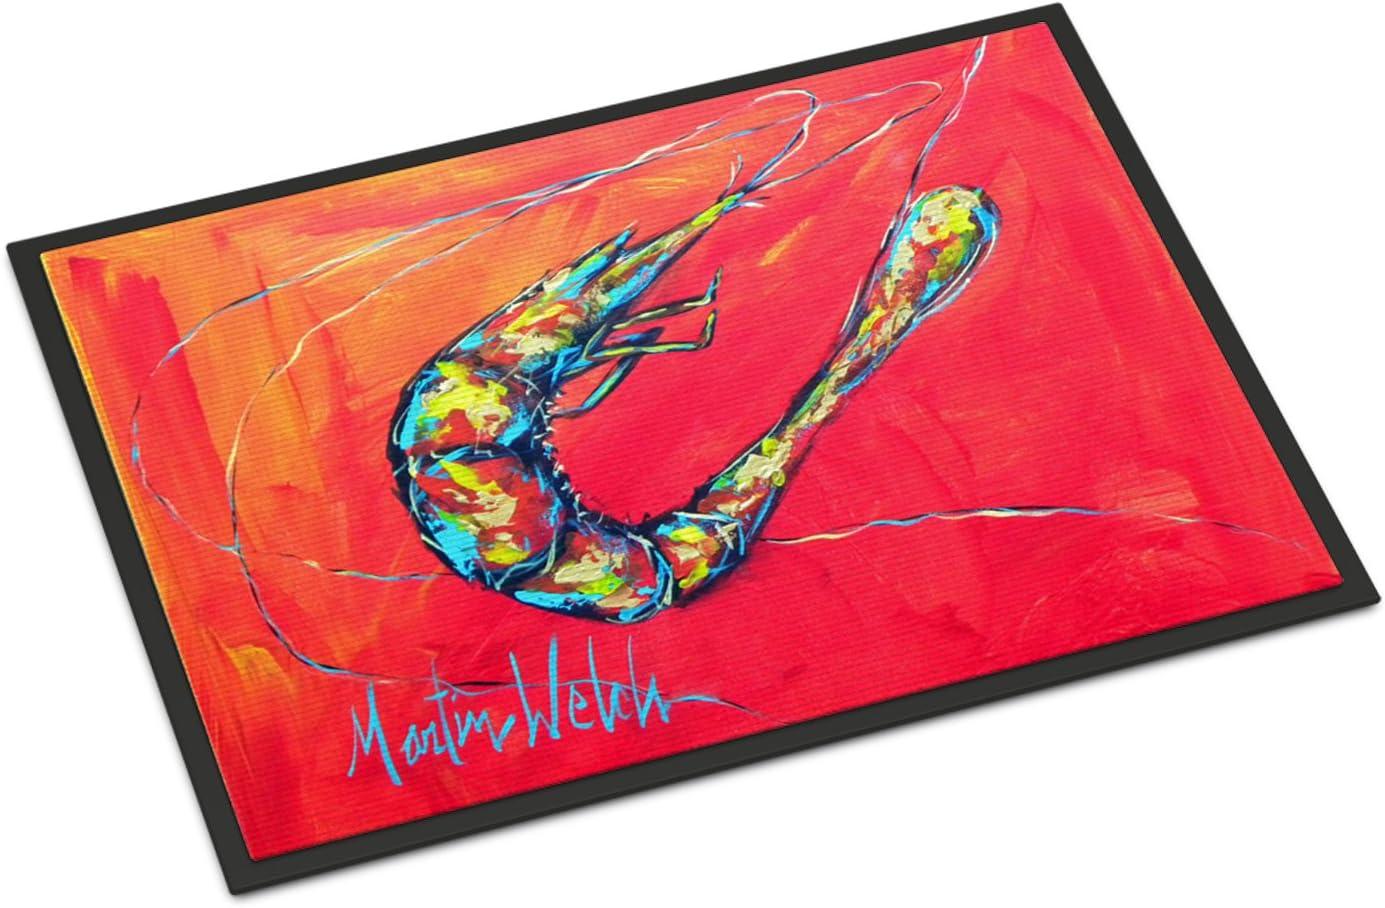 Carolines Treasures Shrimp Floor Mat 19 x 27 Multicolor